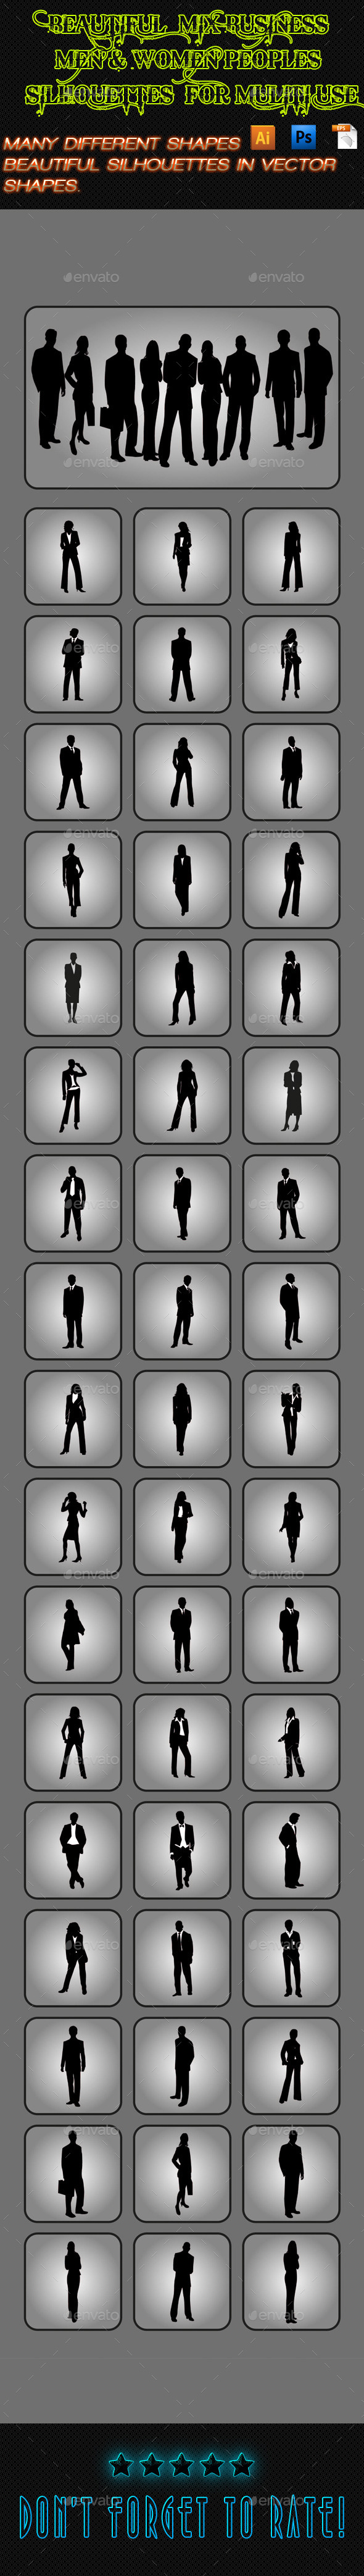 Business Men & Women Silhouettes 02